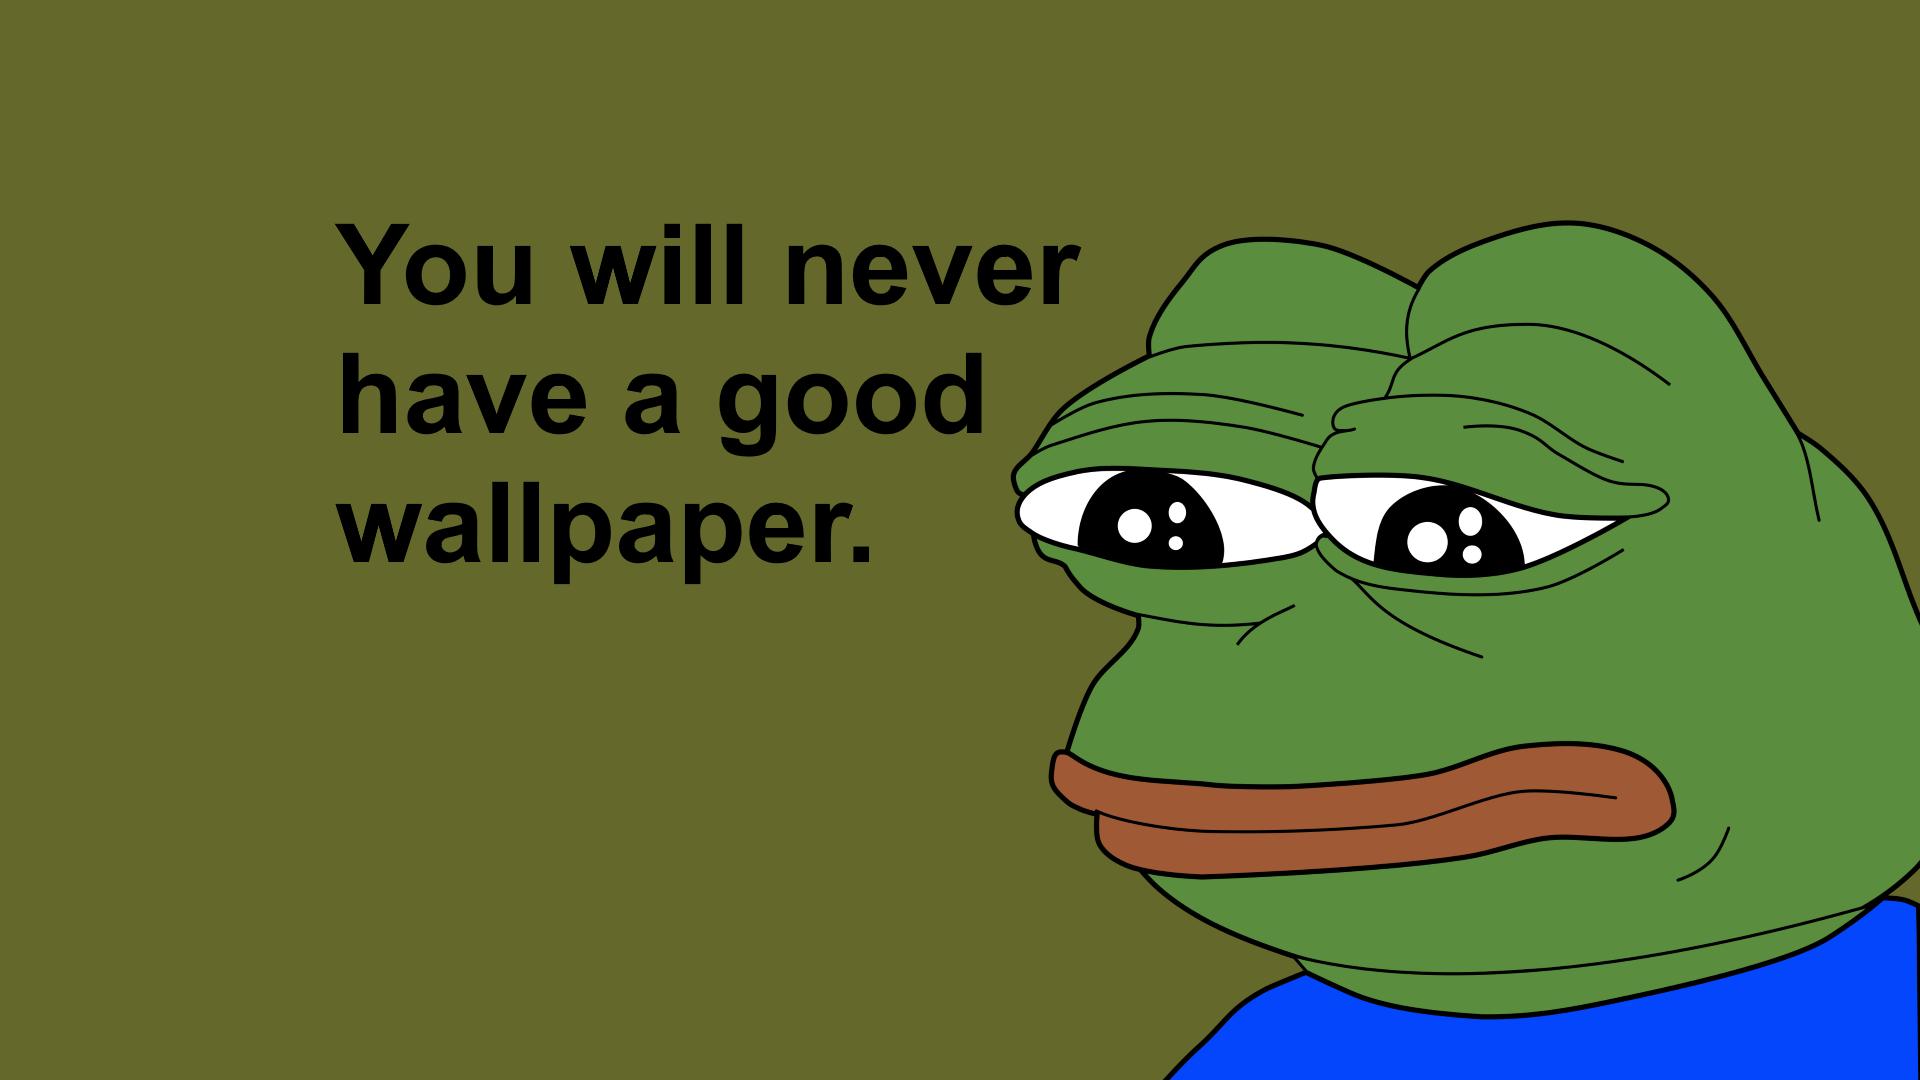 the pepe frog wallpaper - photo #5